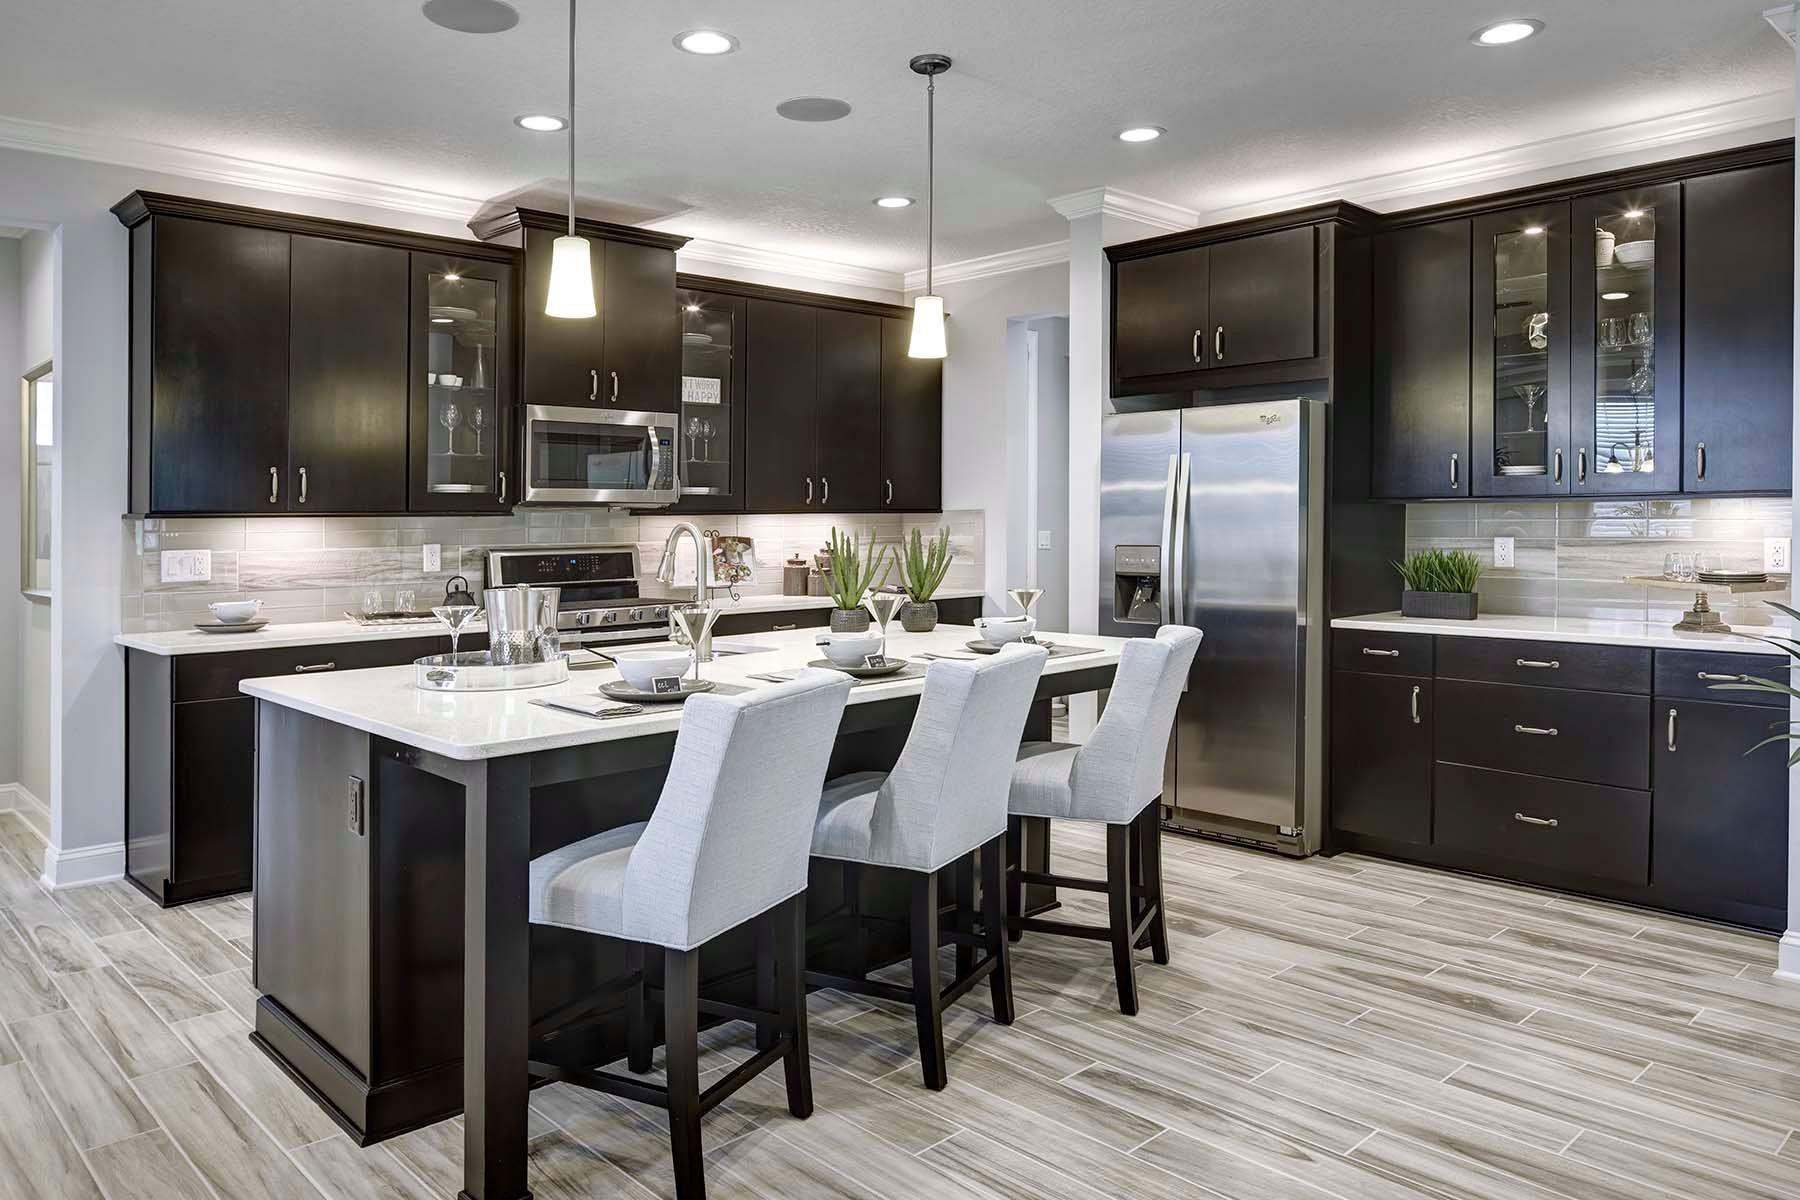 Kitchen featured in the Egret By Mattamy Homes in Jacksonville-St. Augustine, FL